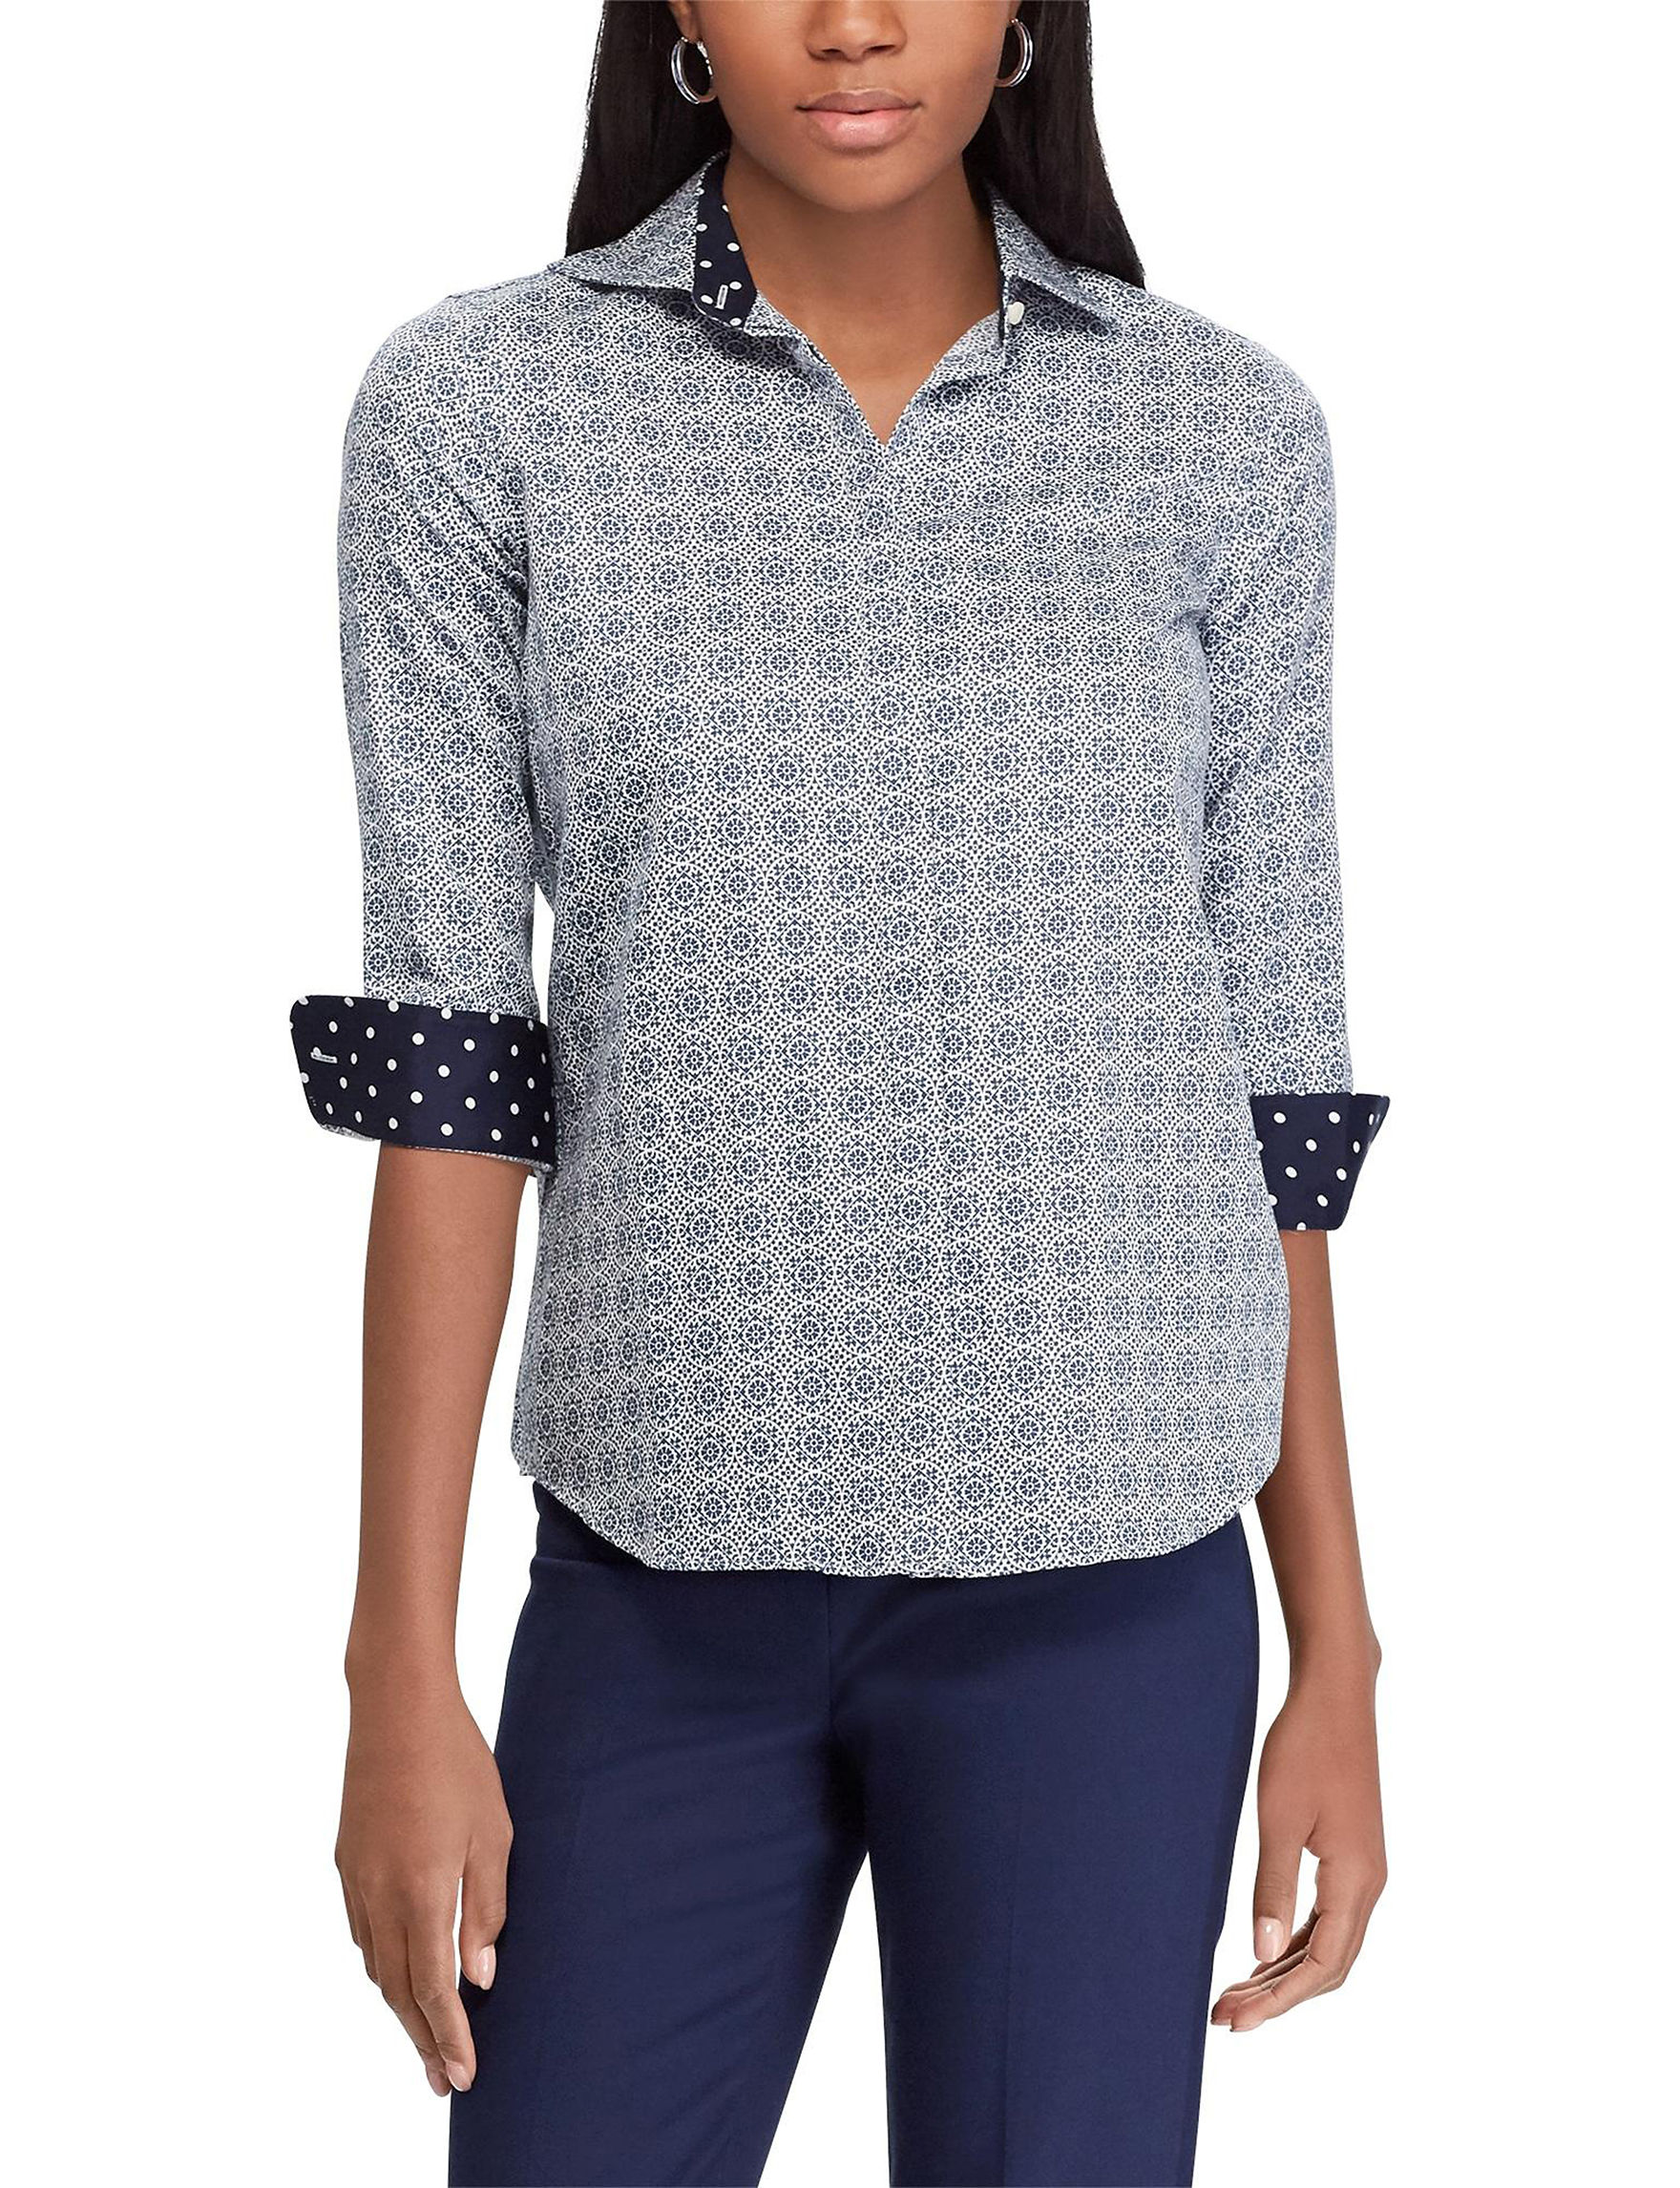 Chaps White / Navy Shirts & Blouses